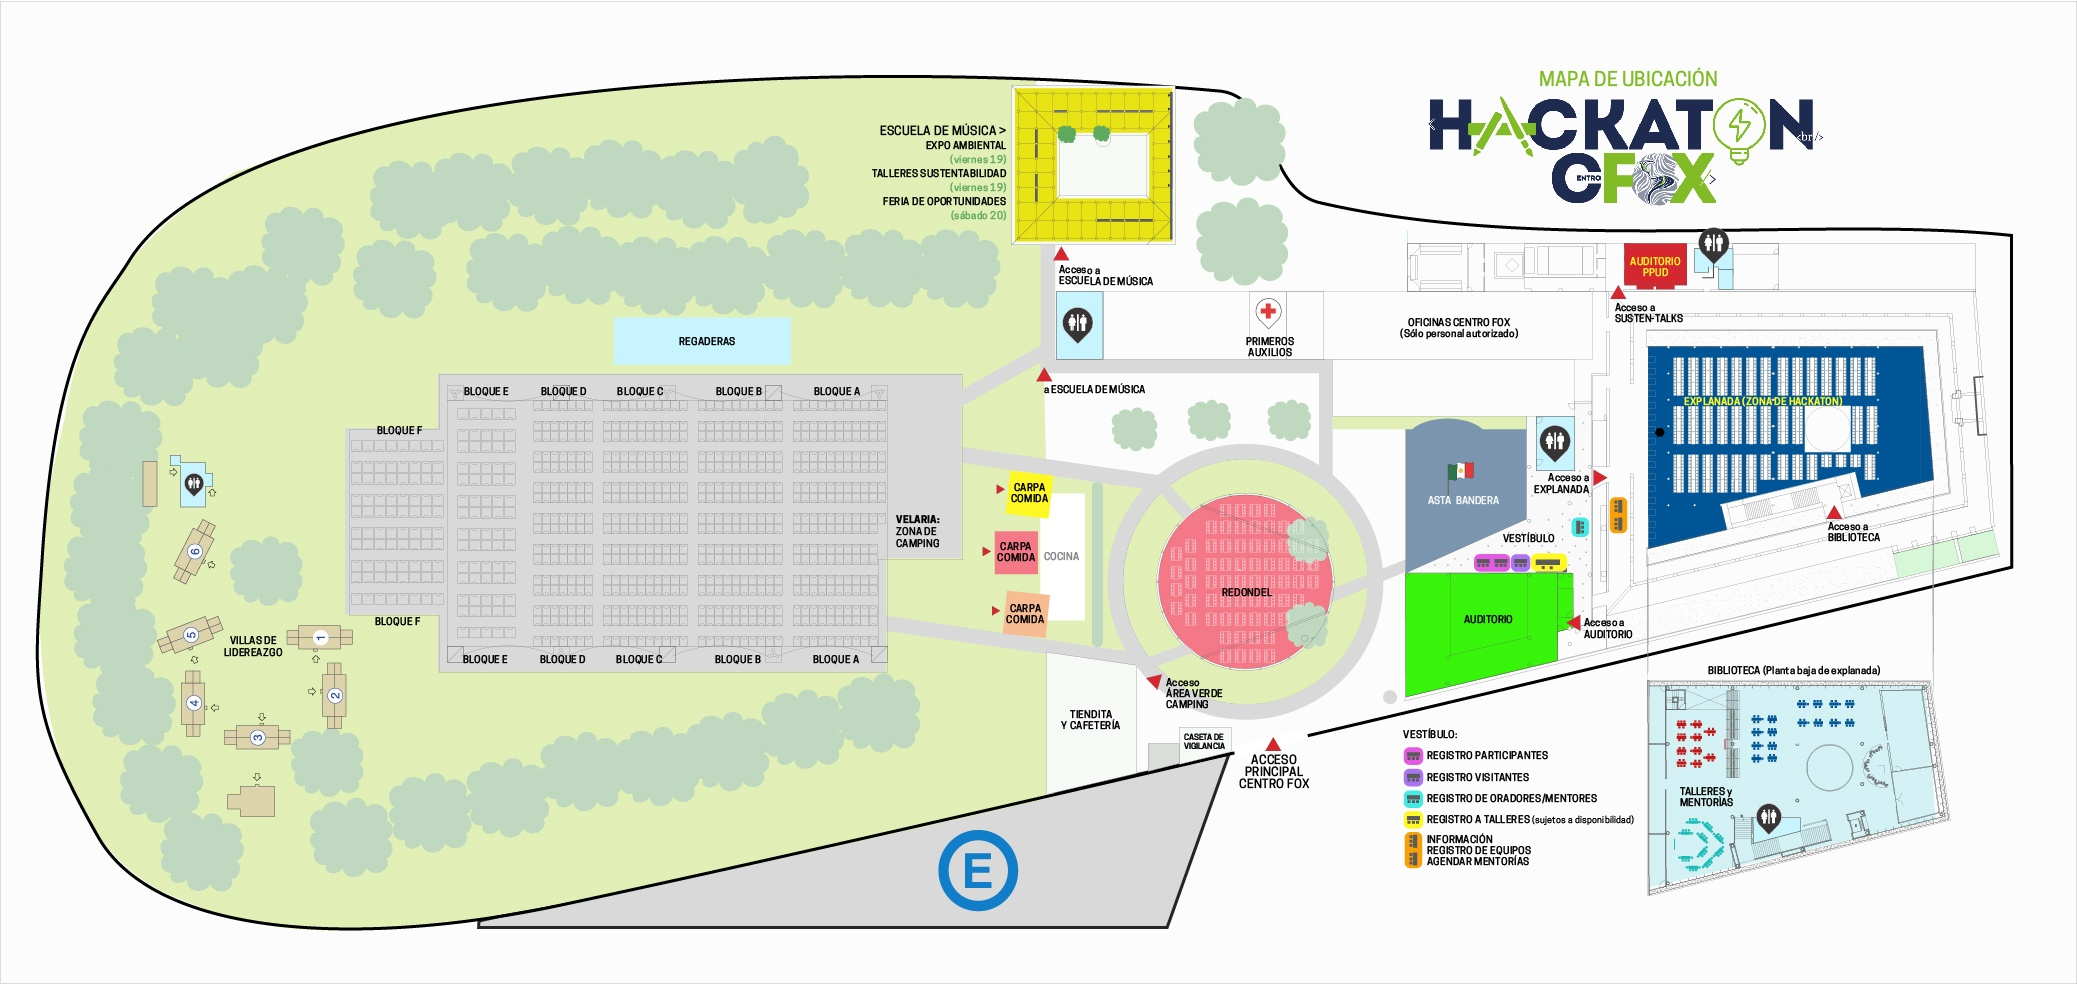 Mapa Ubicacion Hackaton 2017_final.jpg